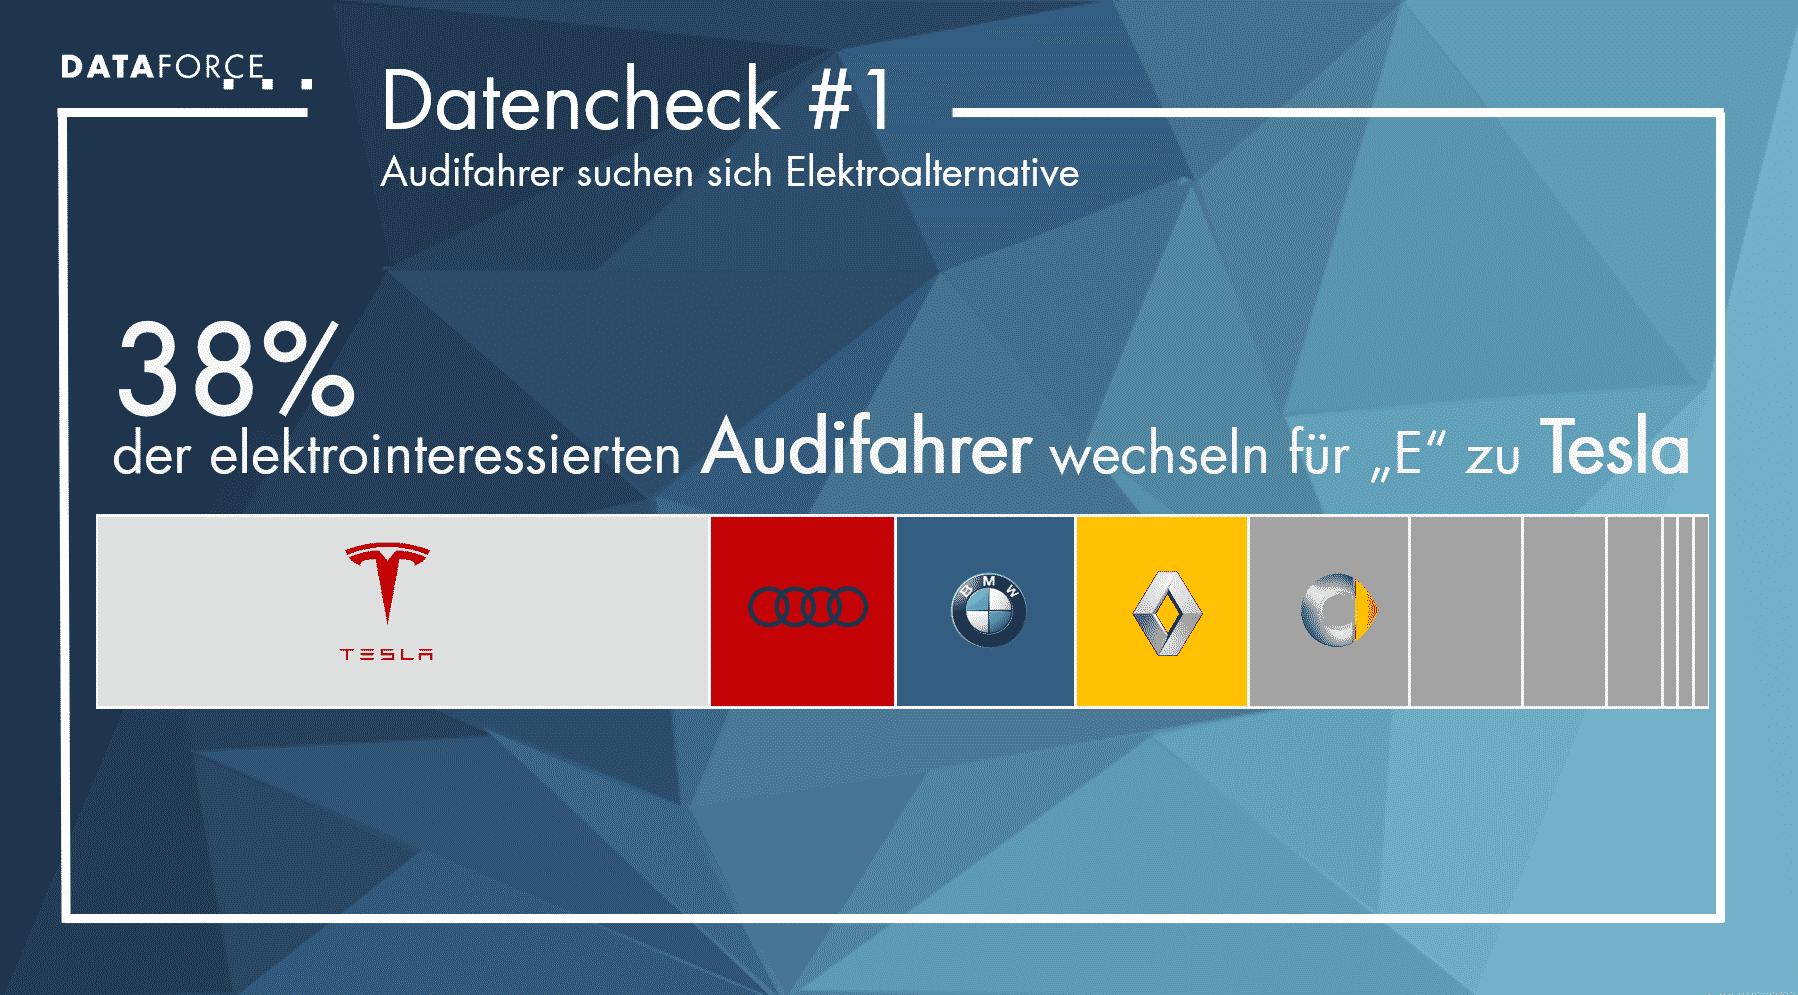 Dataforce Infografik Markentreue Datencheck 1